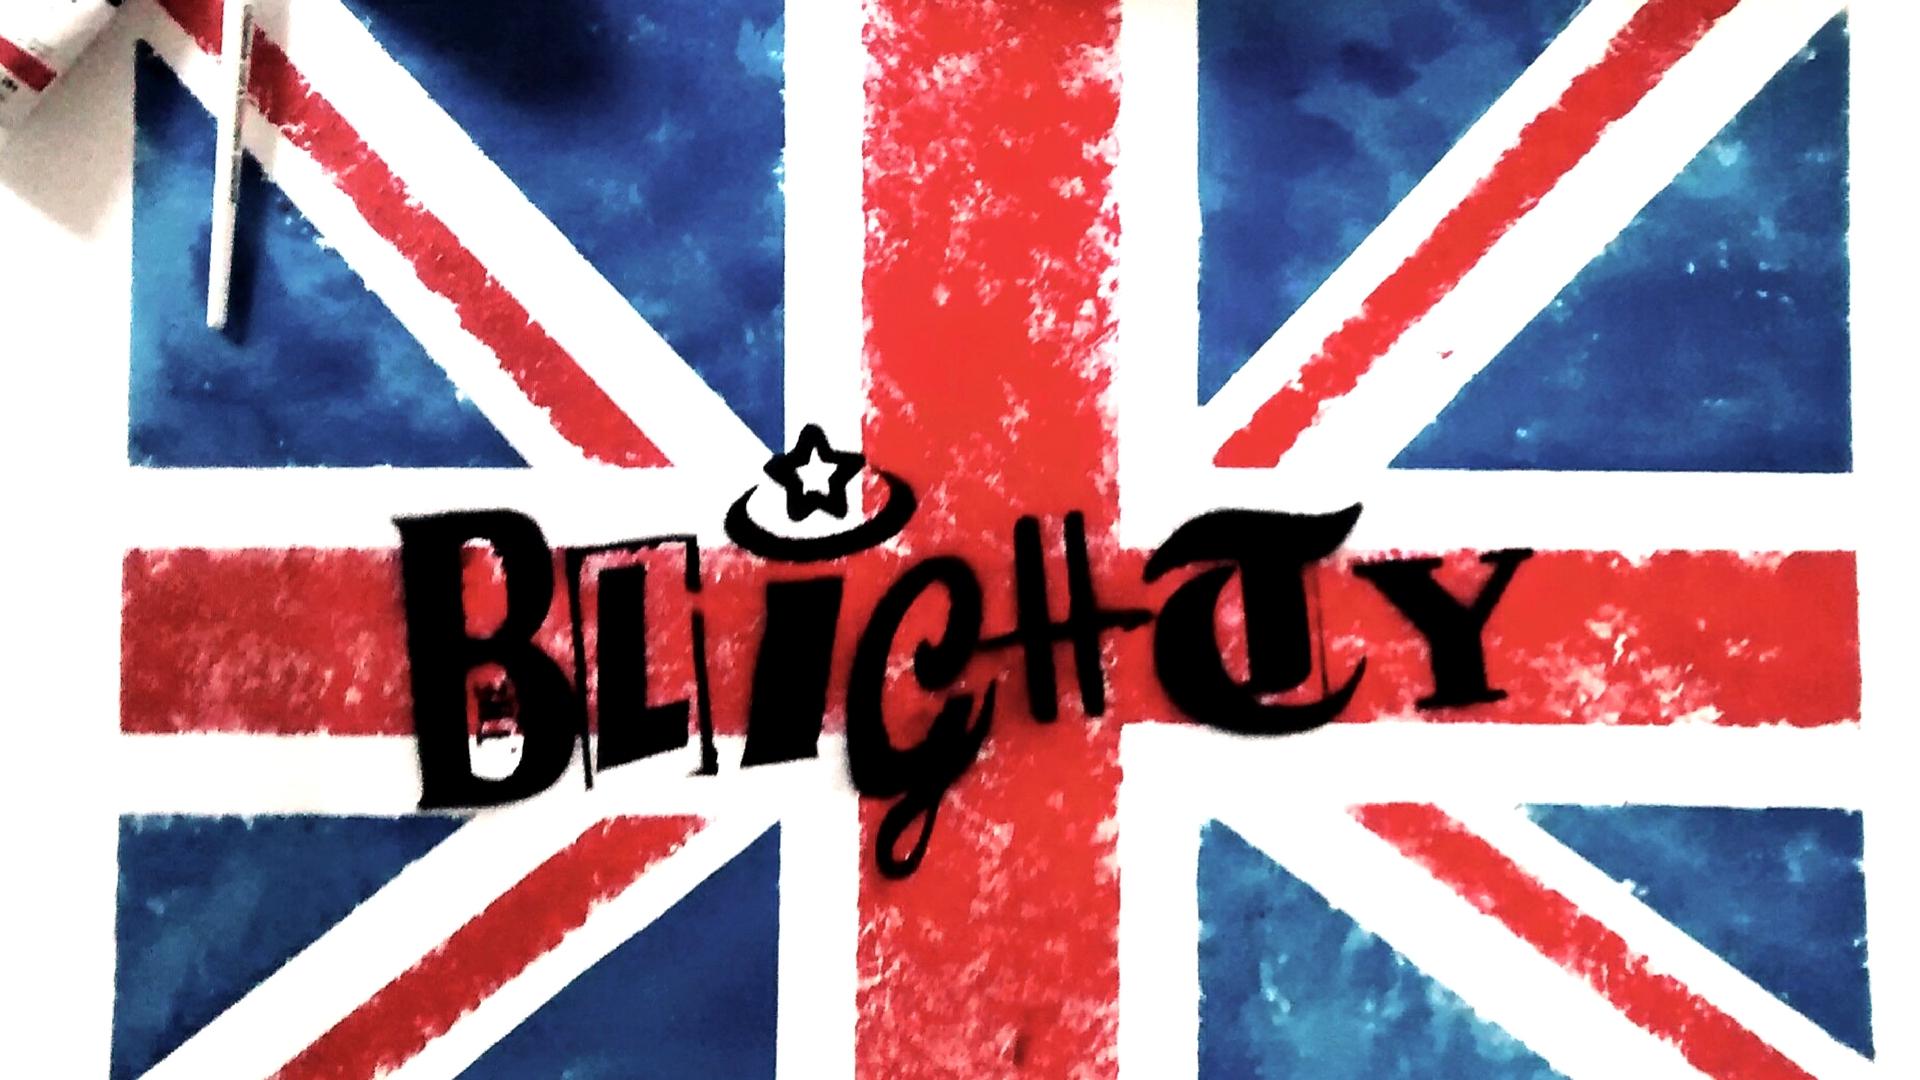 Blighty Union Jack Made in Britain © Joe Alvarez